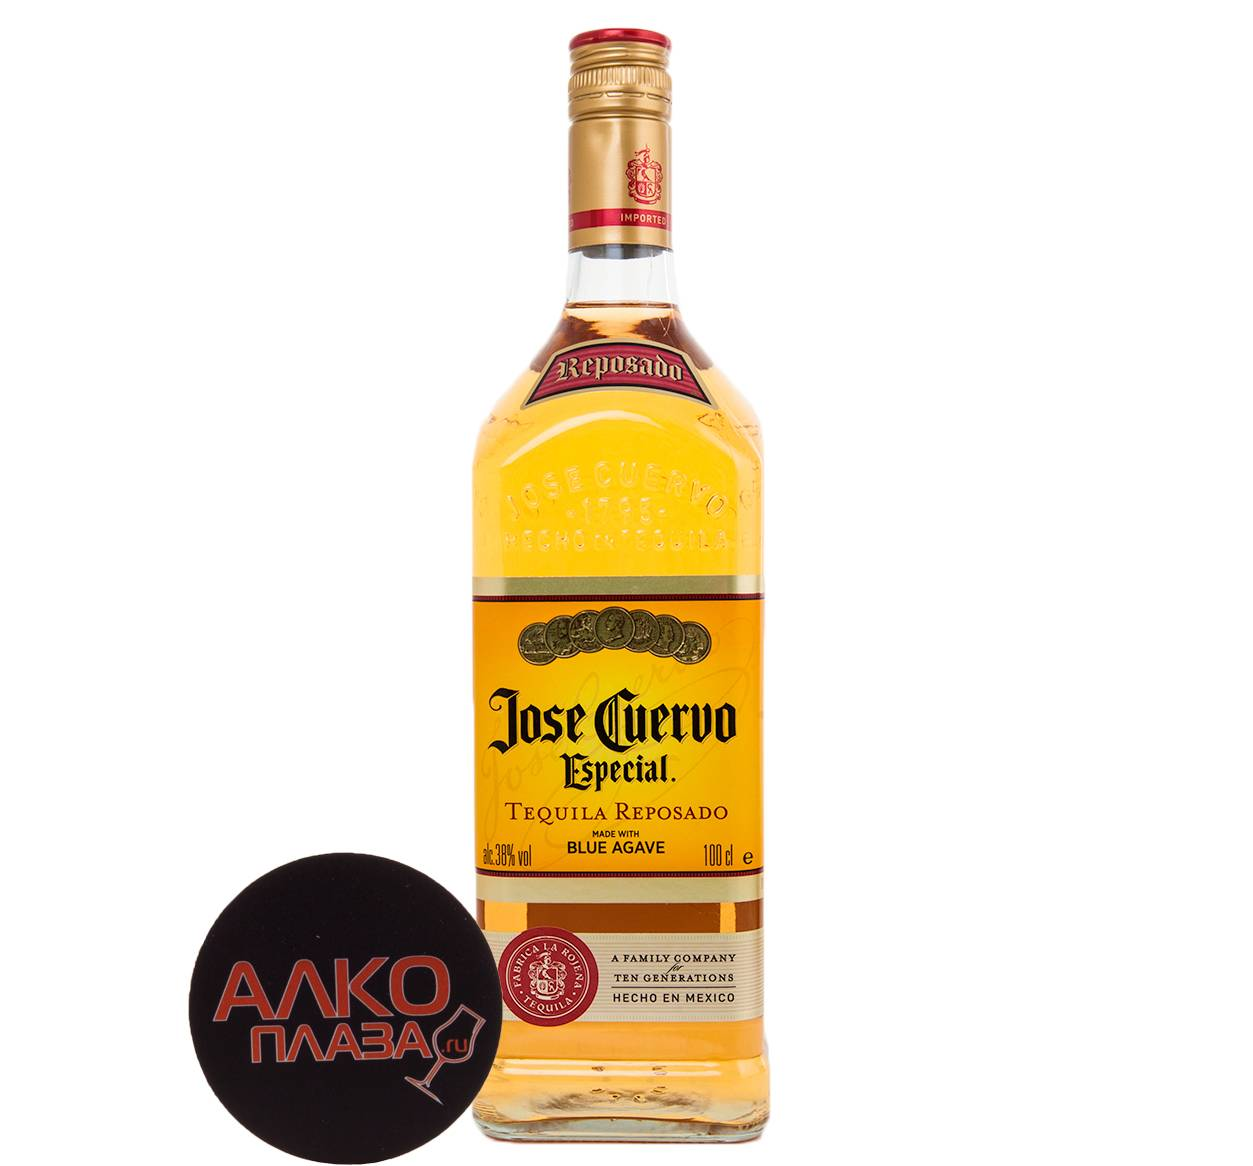 Текила хосе куэрво (jose cuervo) – особенности, виды, история марки